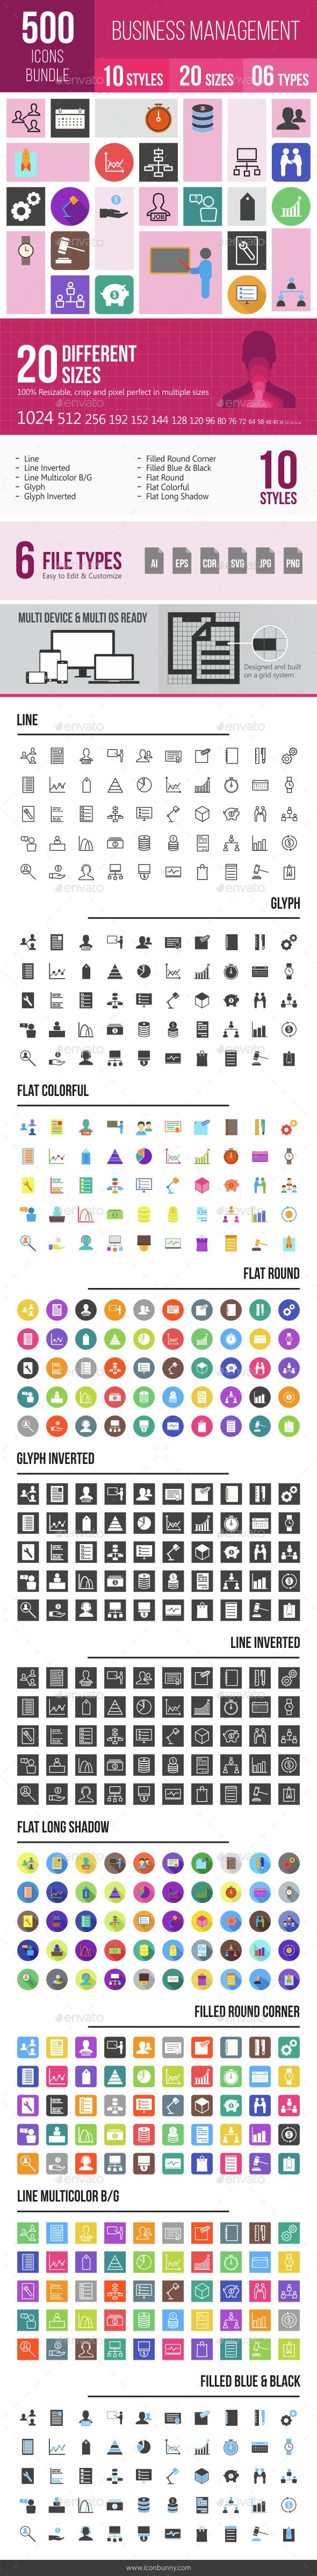 500 Business Management Icons Bundle - Icons